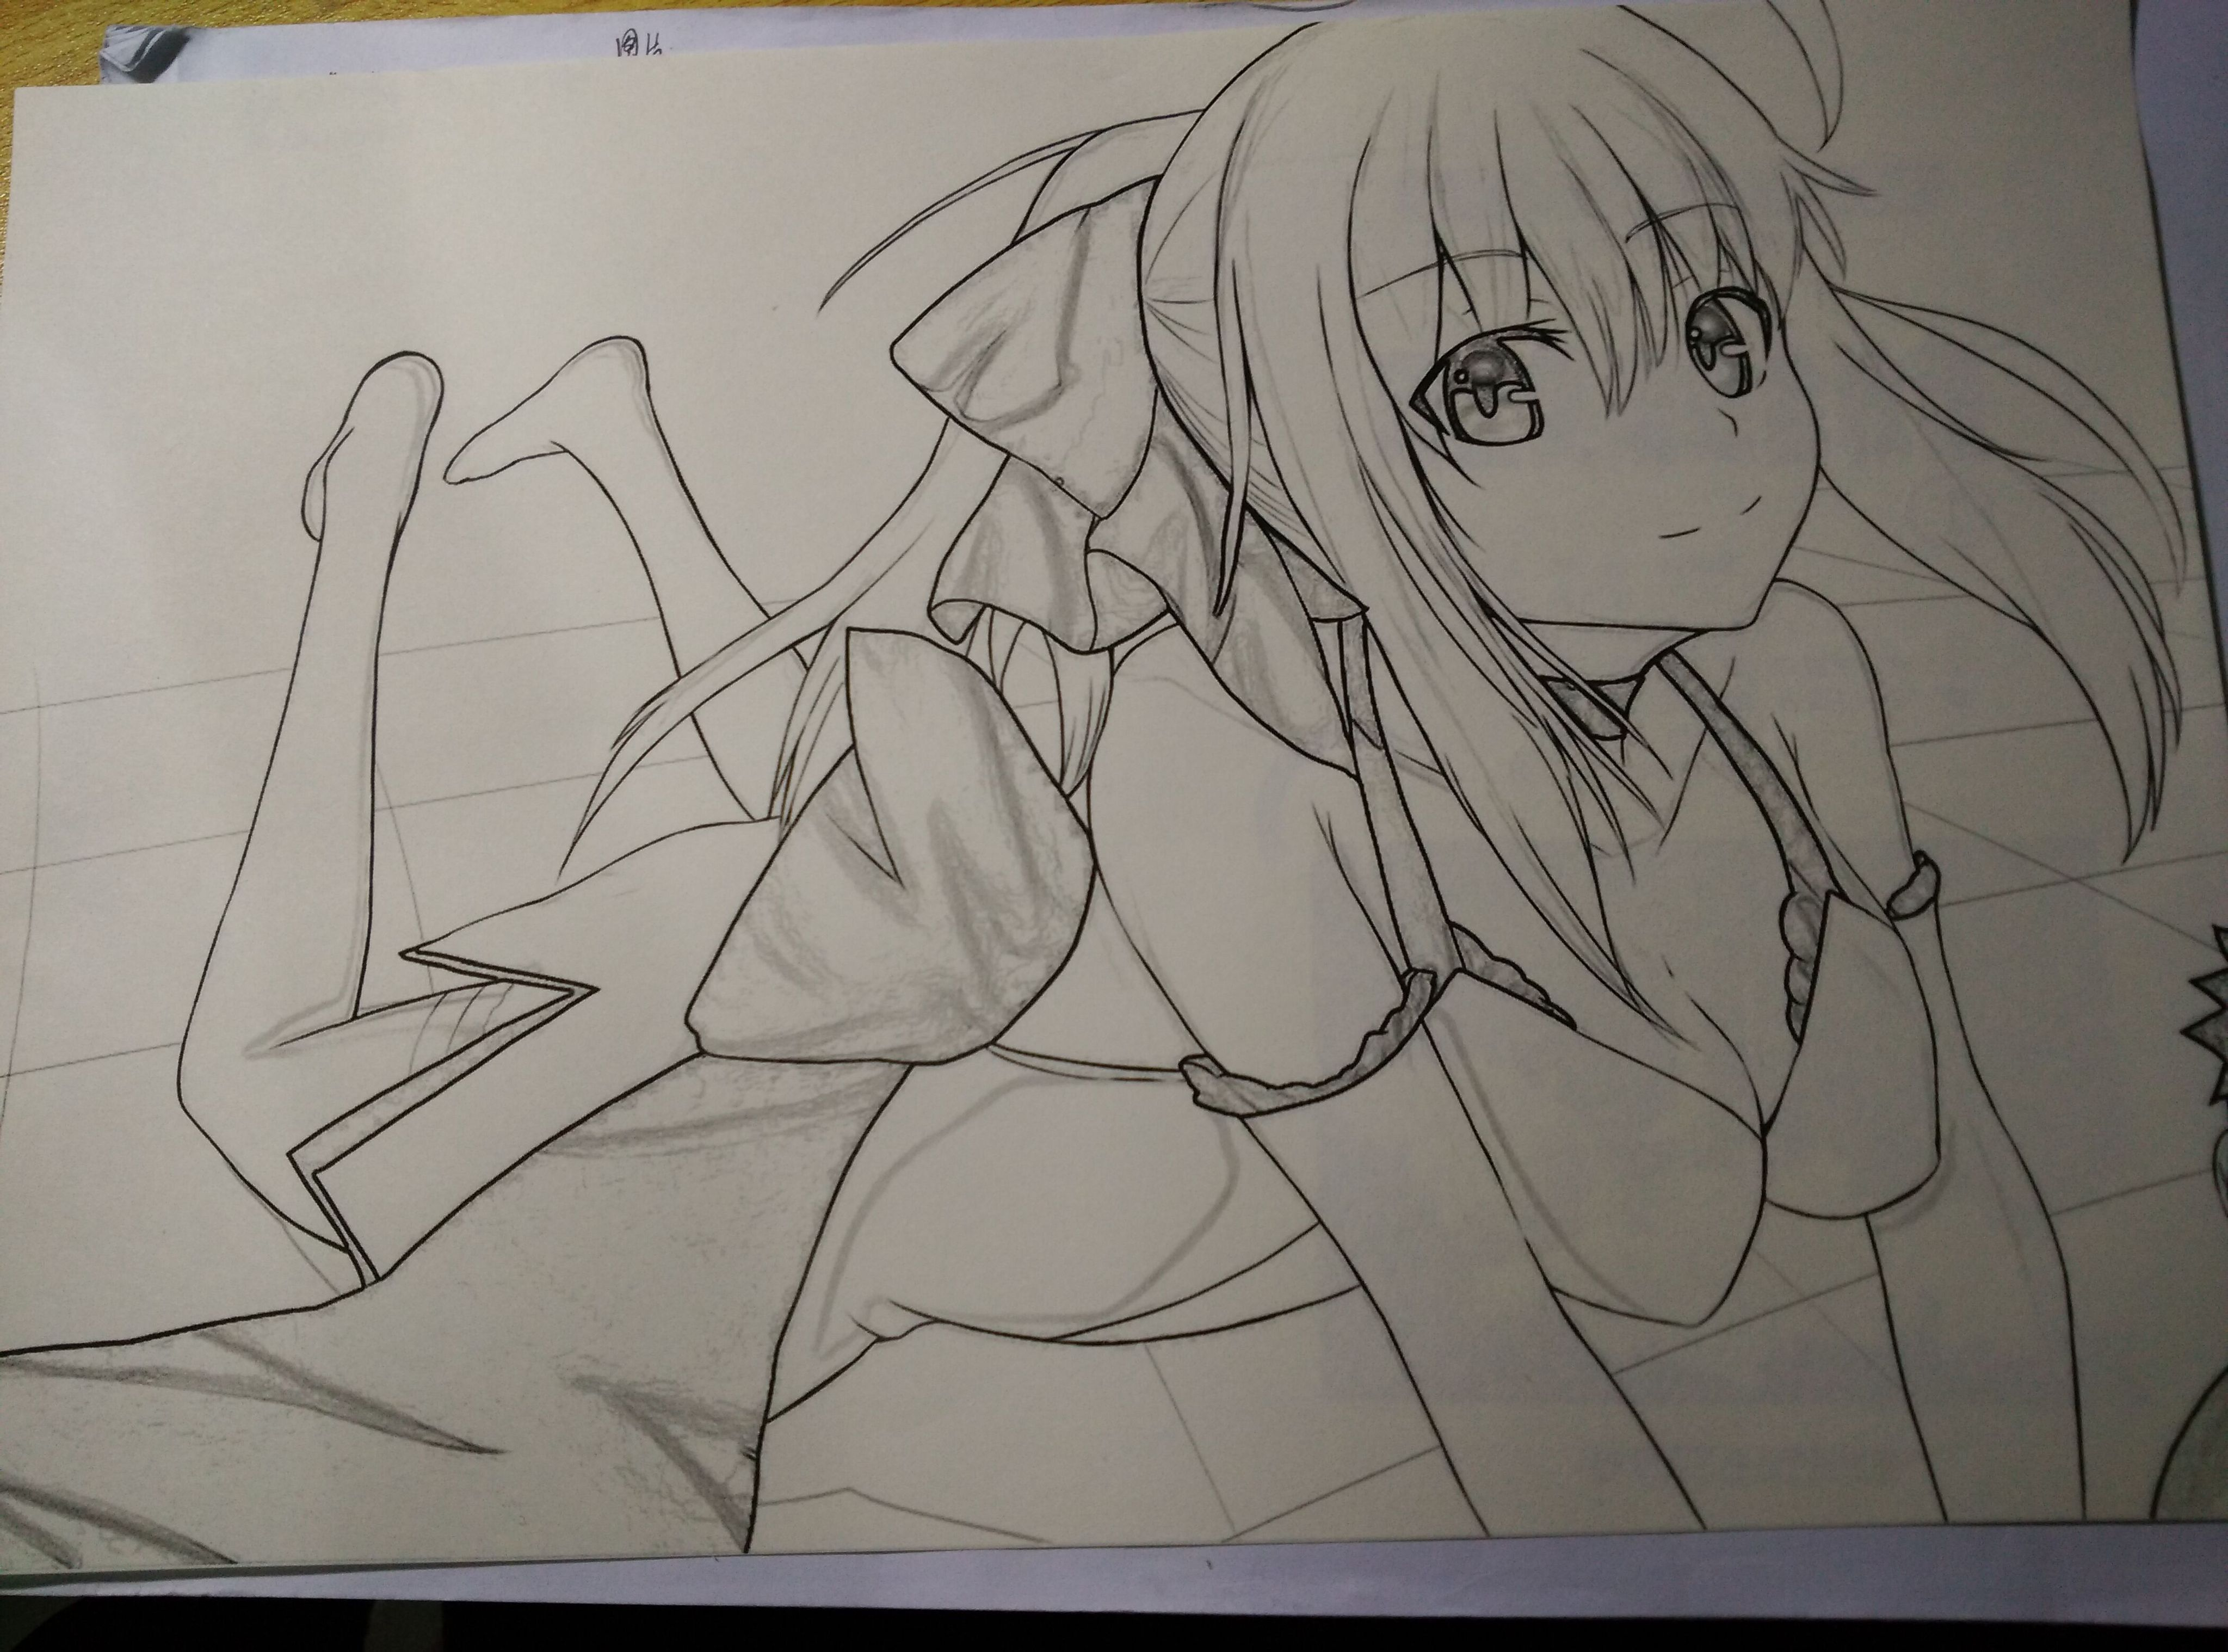 saber手绘铅笔画